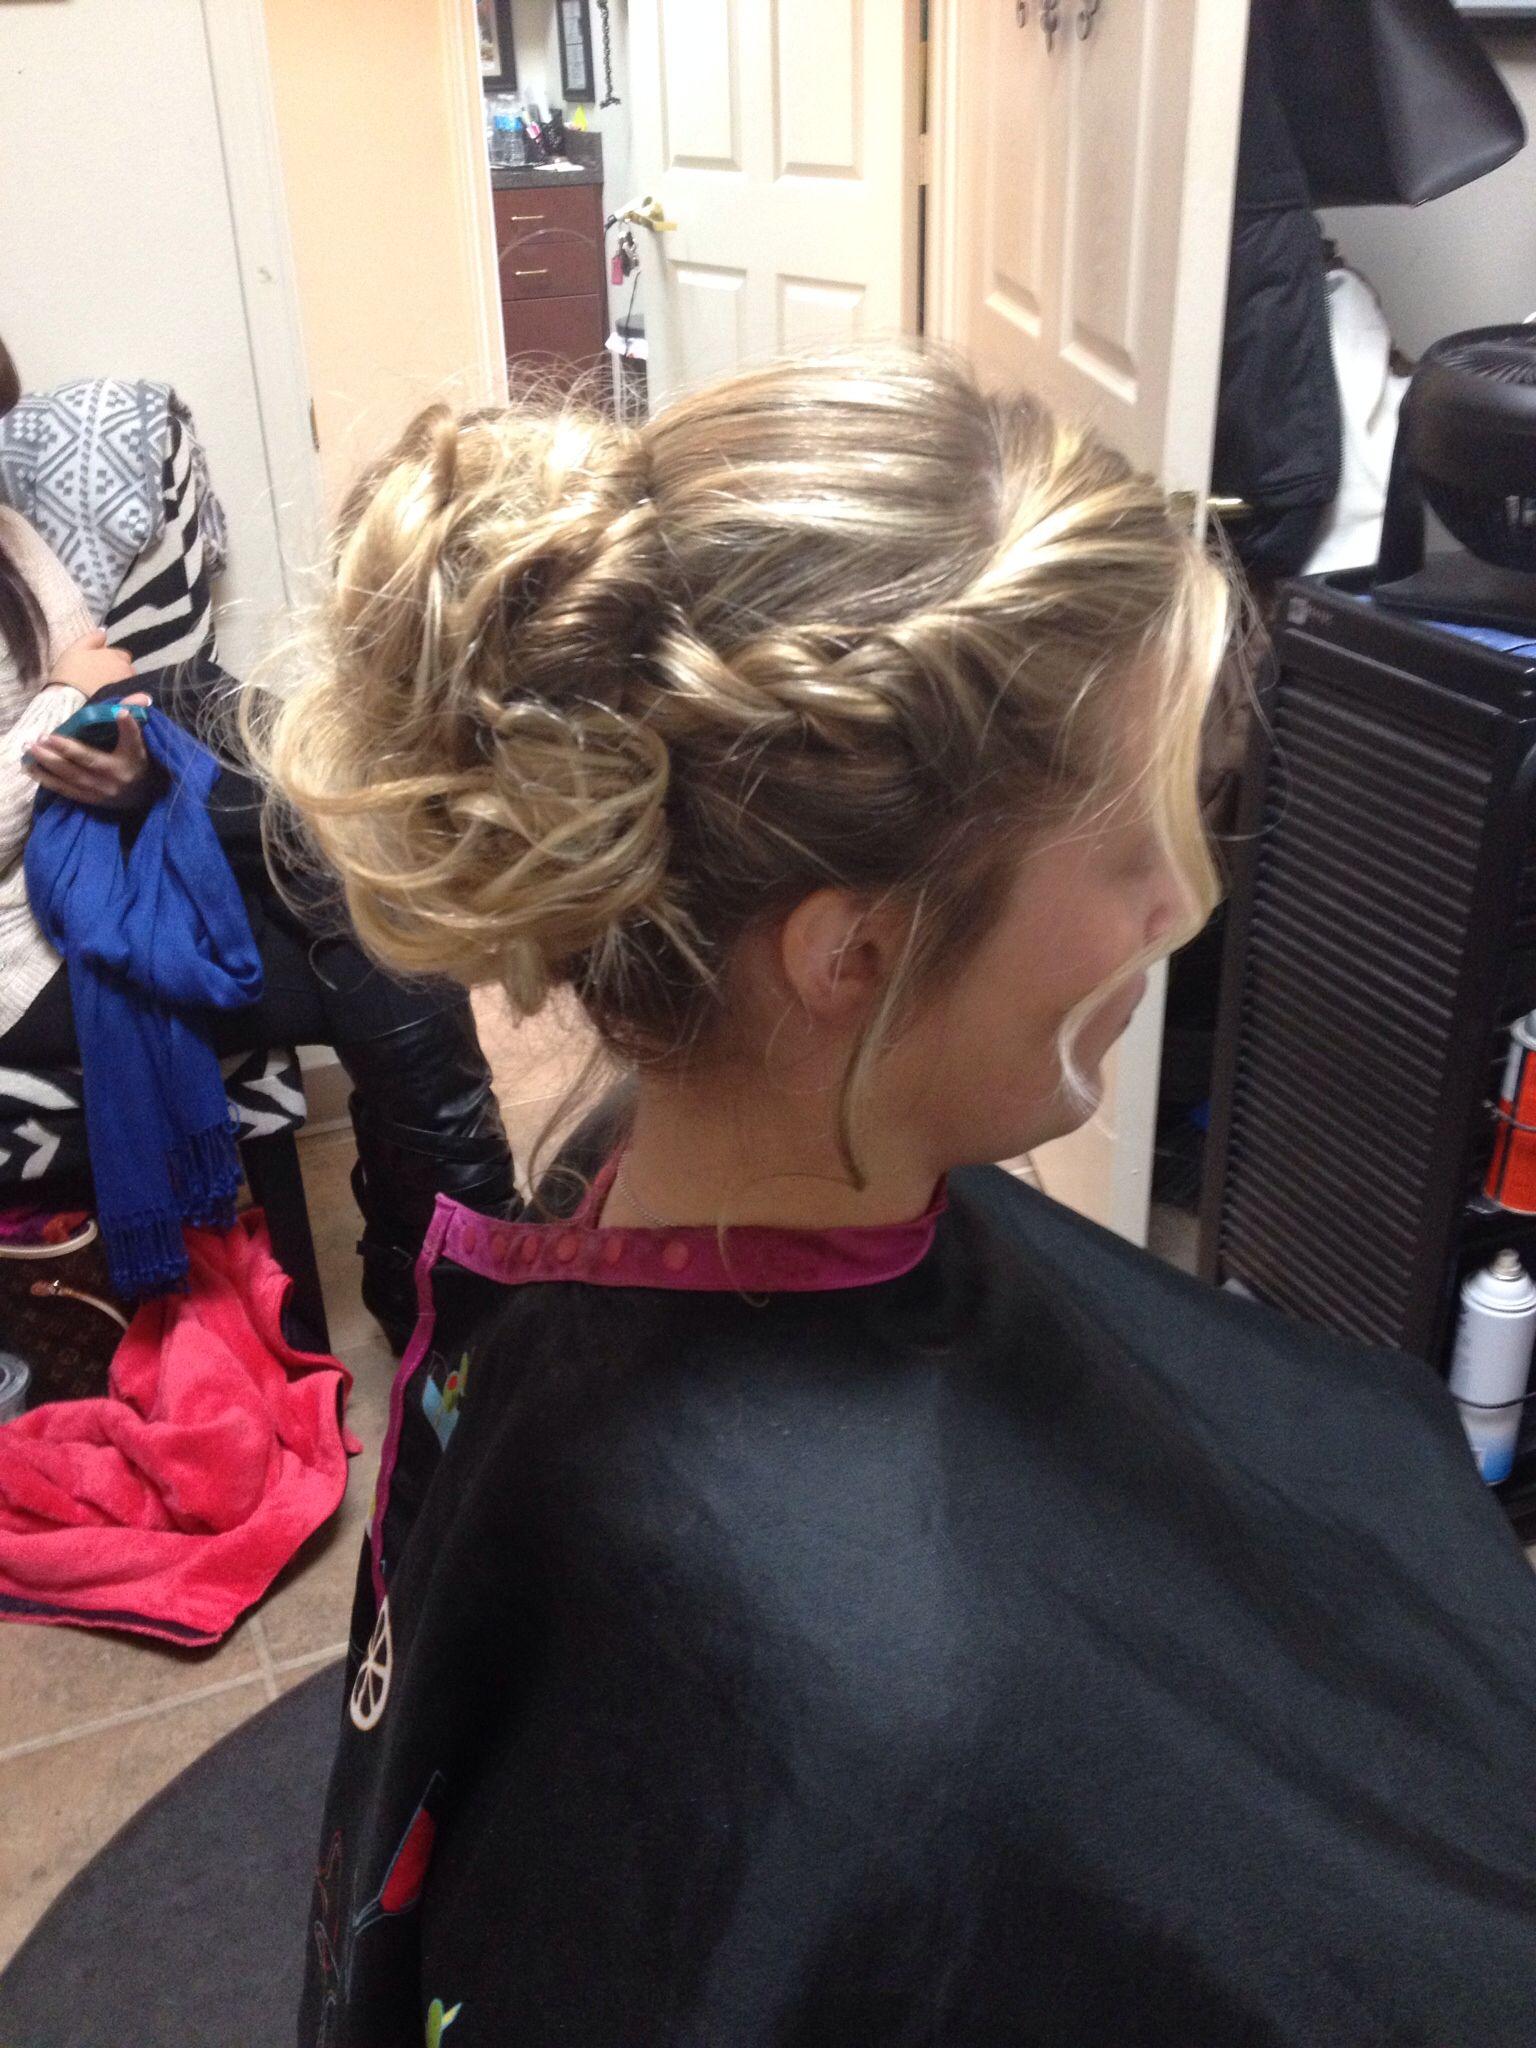 Hair By Stephanie 896 778 3991 Lubbock Tx Wedding Updo Hair Styles Wedding Updo Hair